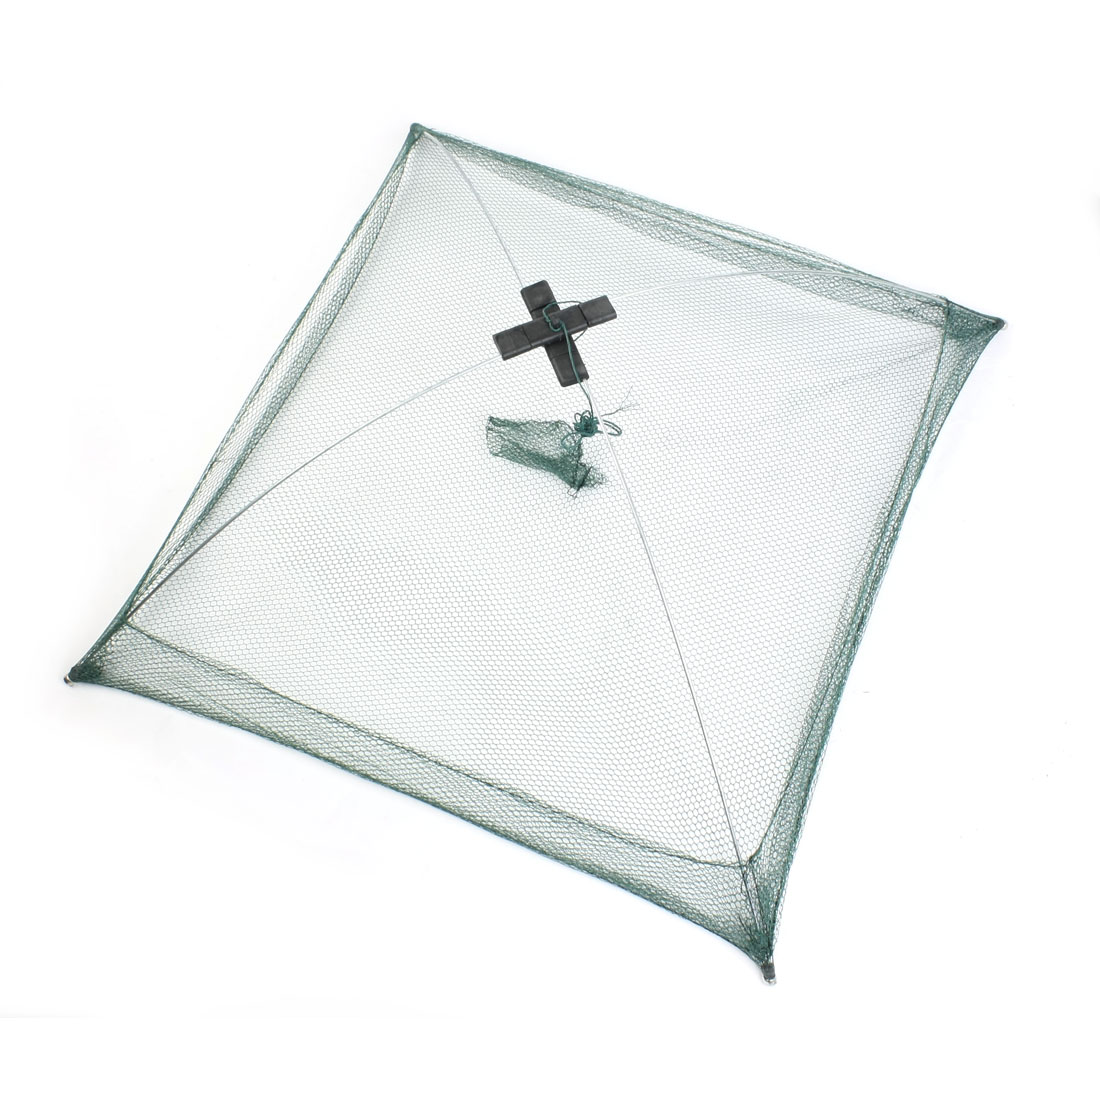 Angler-Angeln-Krabbe-Mesh-Koeder-Regenschirm-Dip-Net-75cm-x-75cm